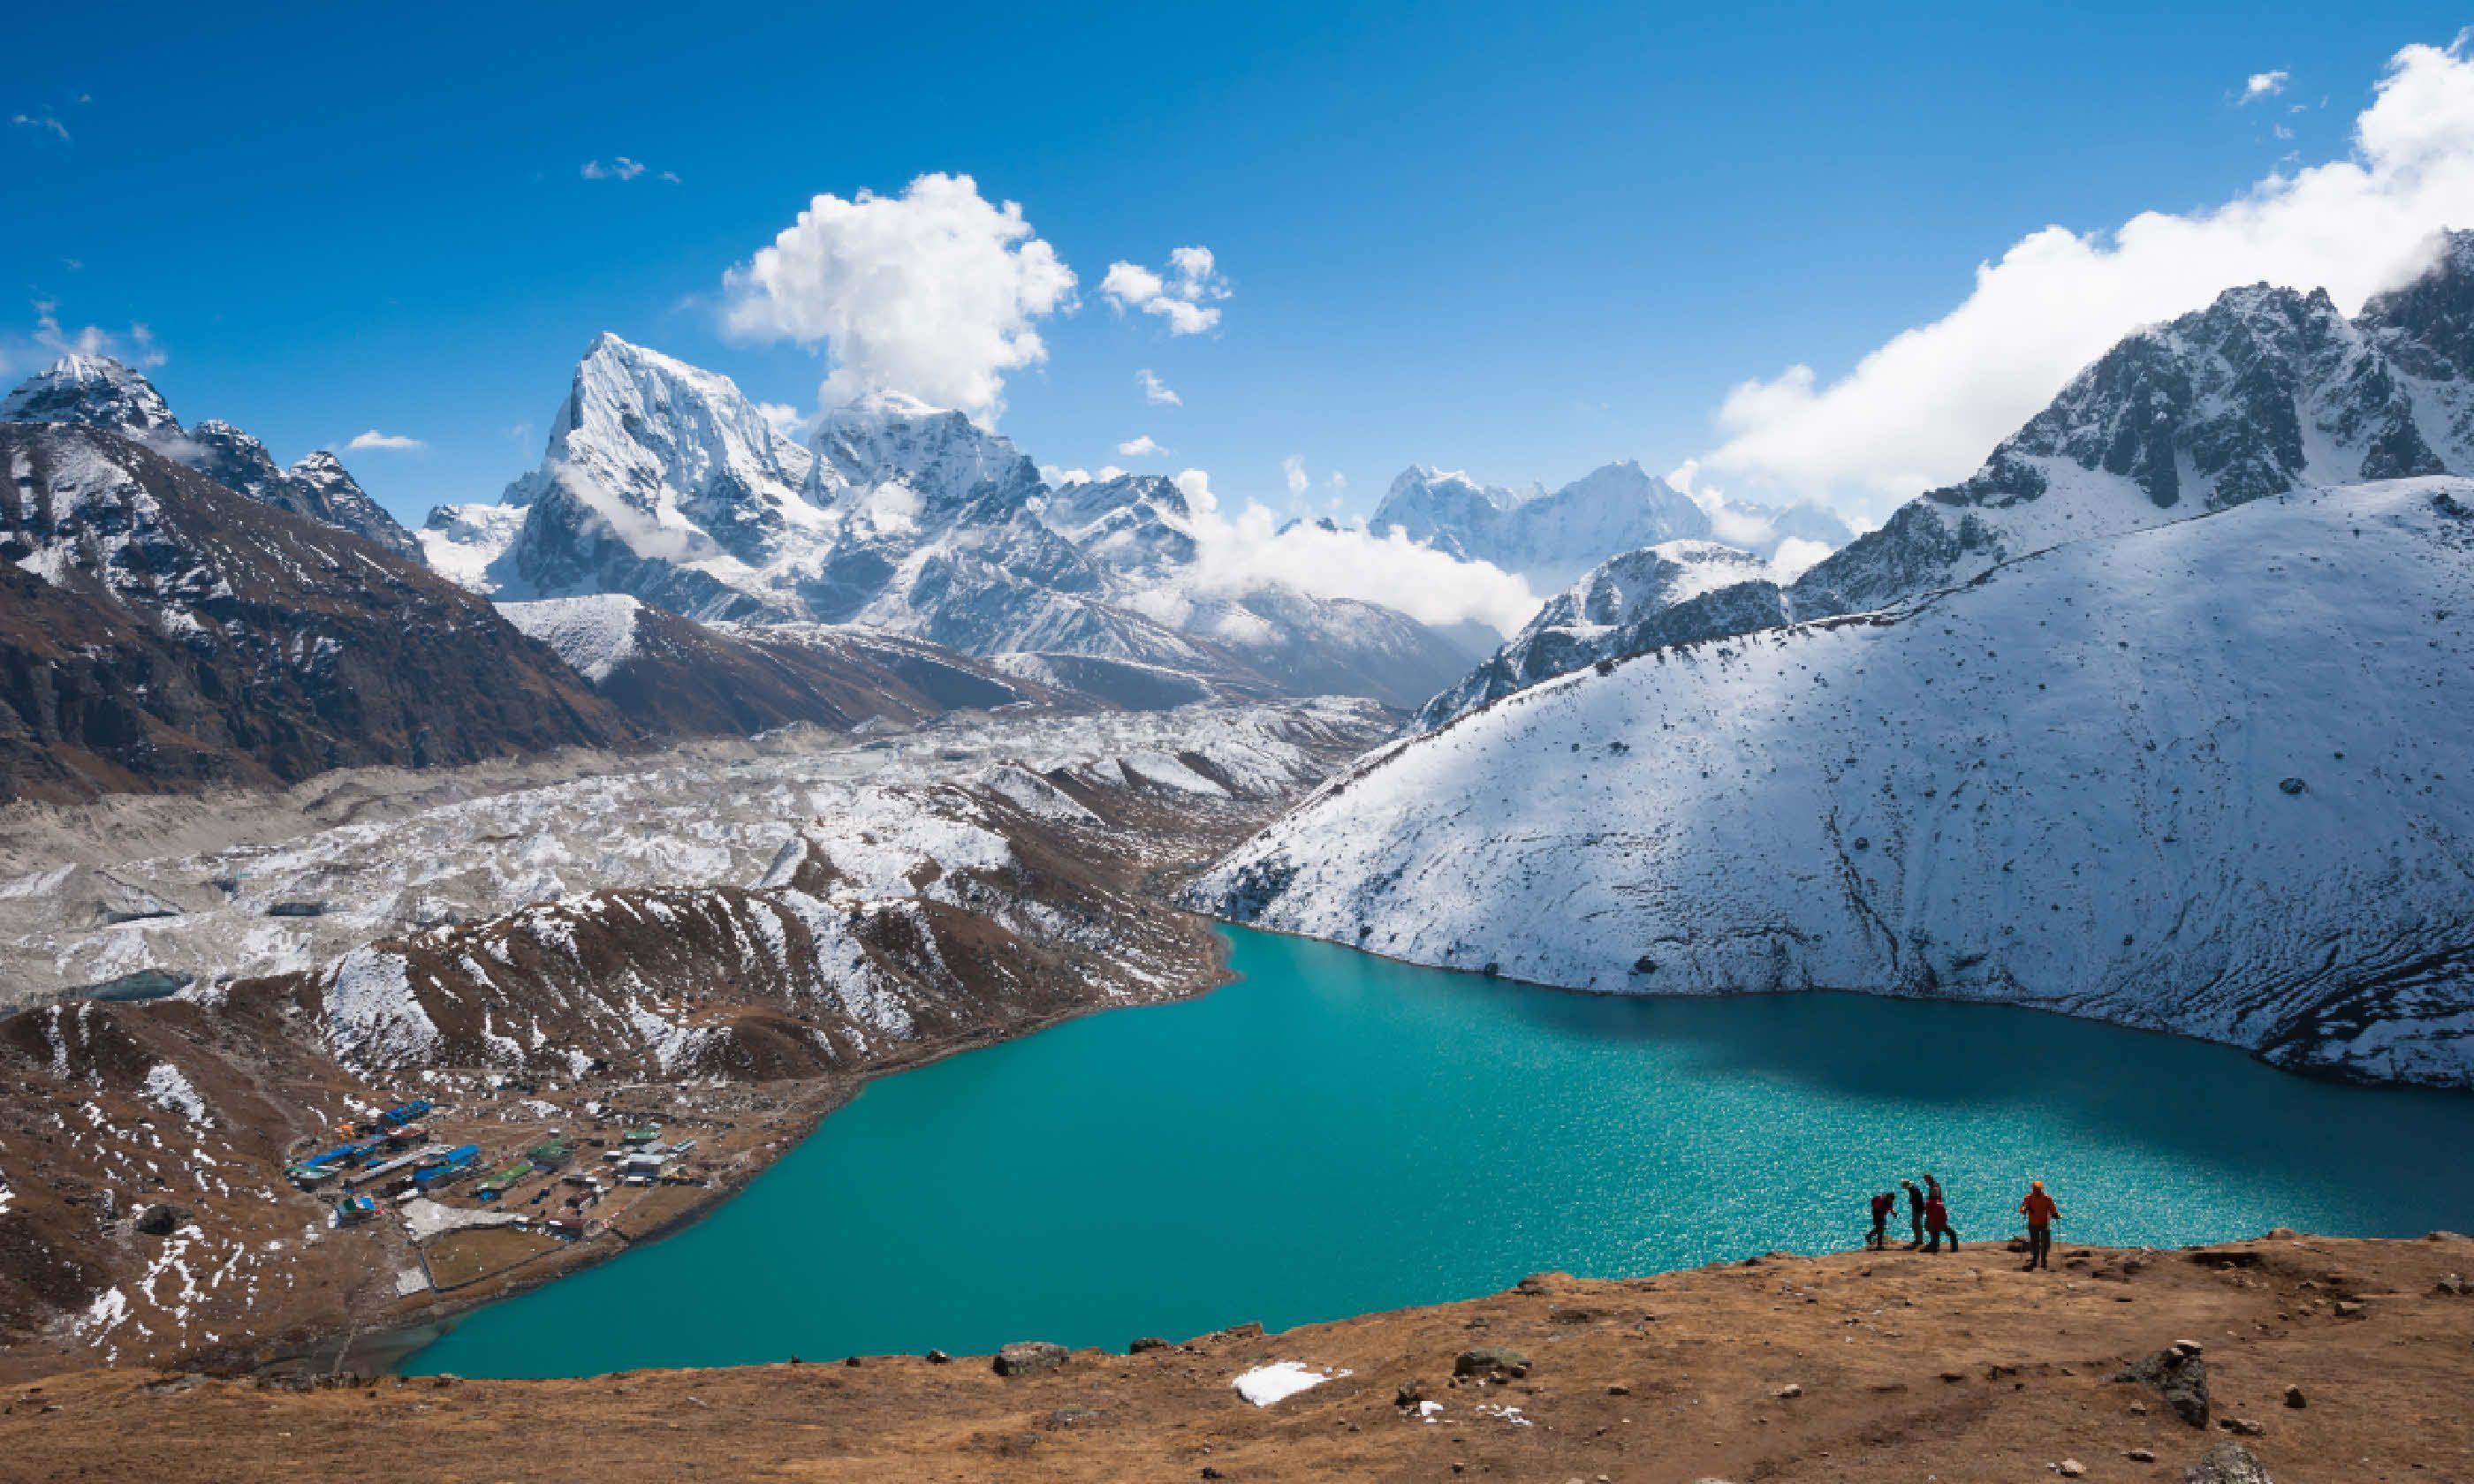 Gokyo lake, Nepal (Shutterstock)